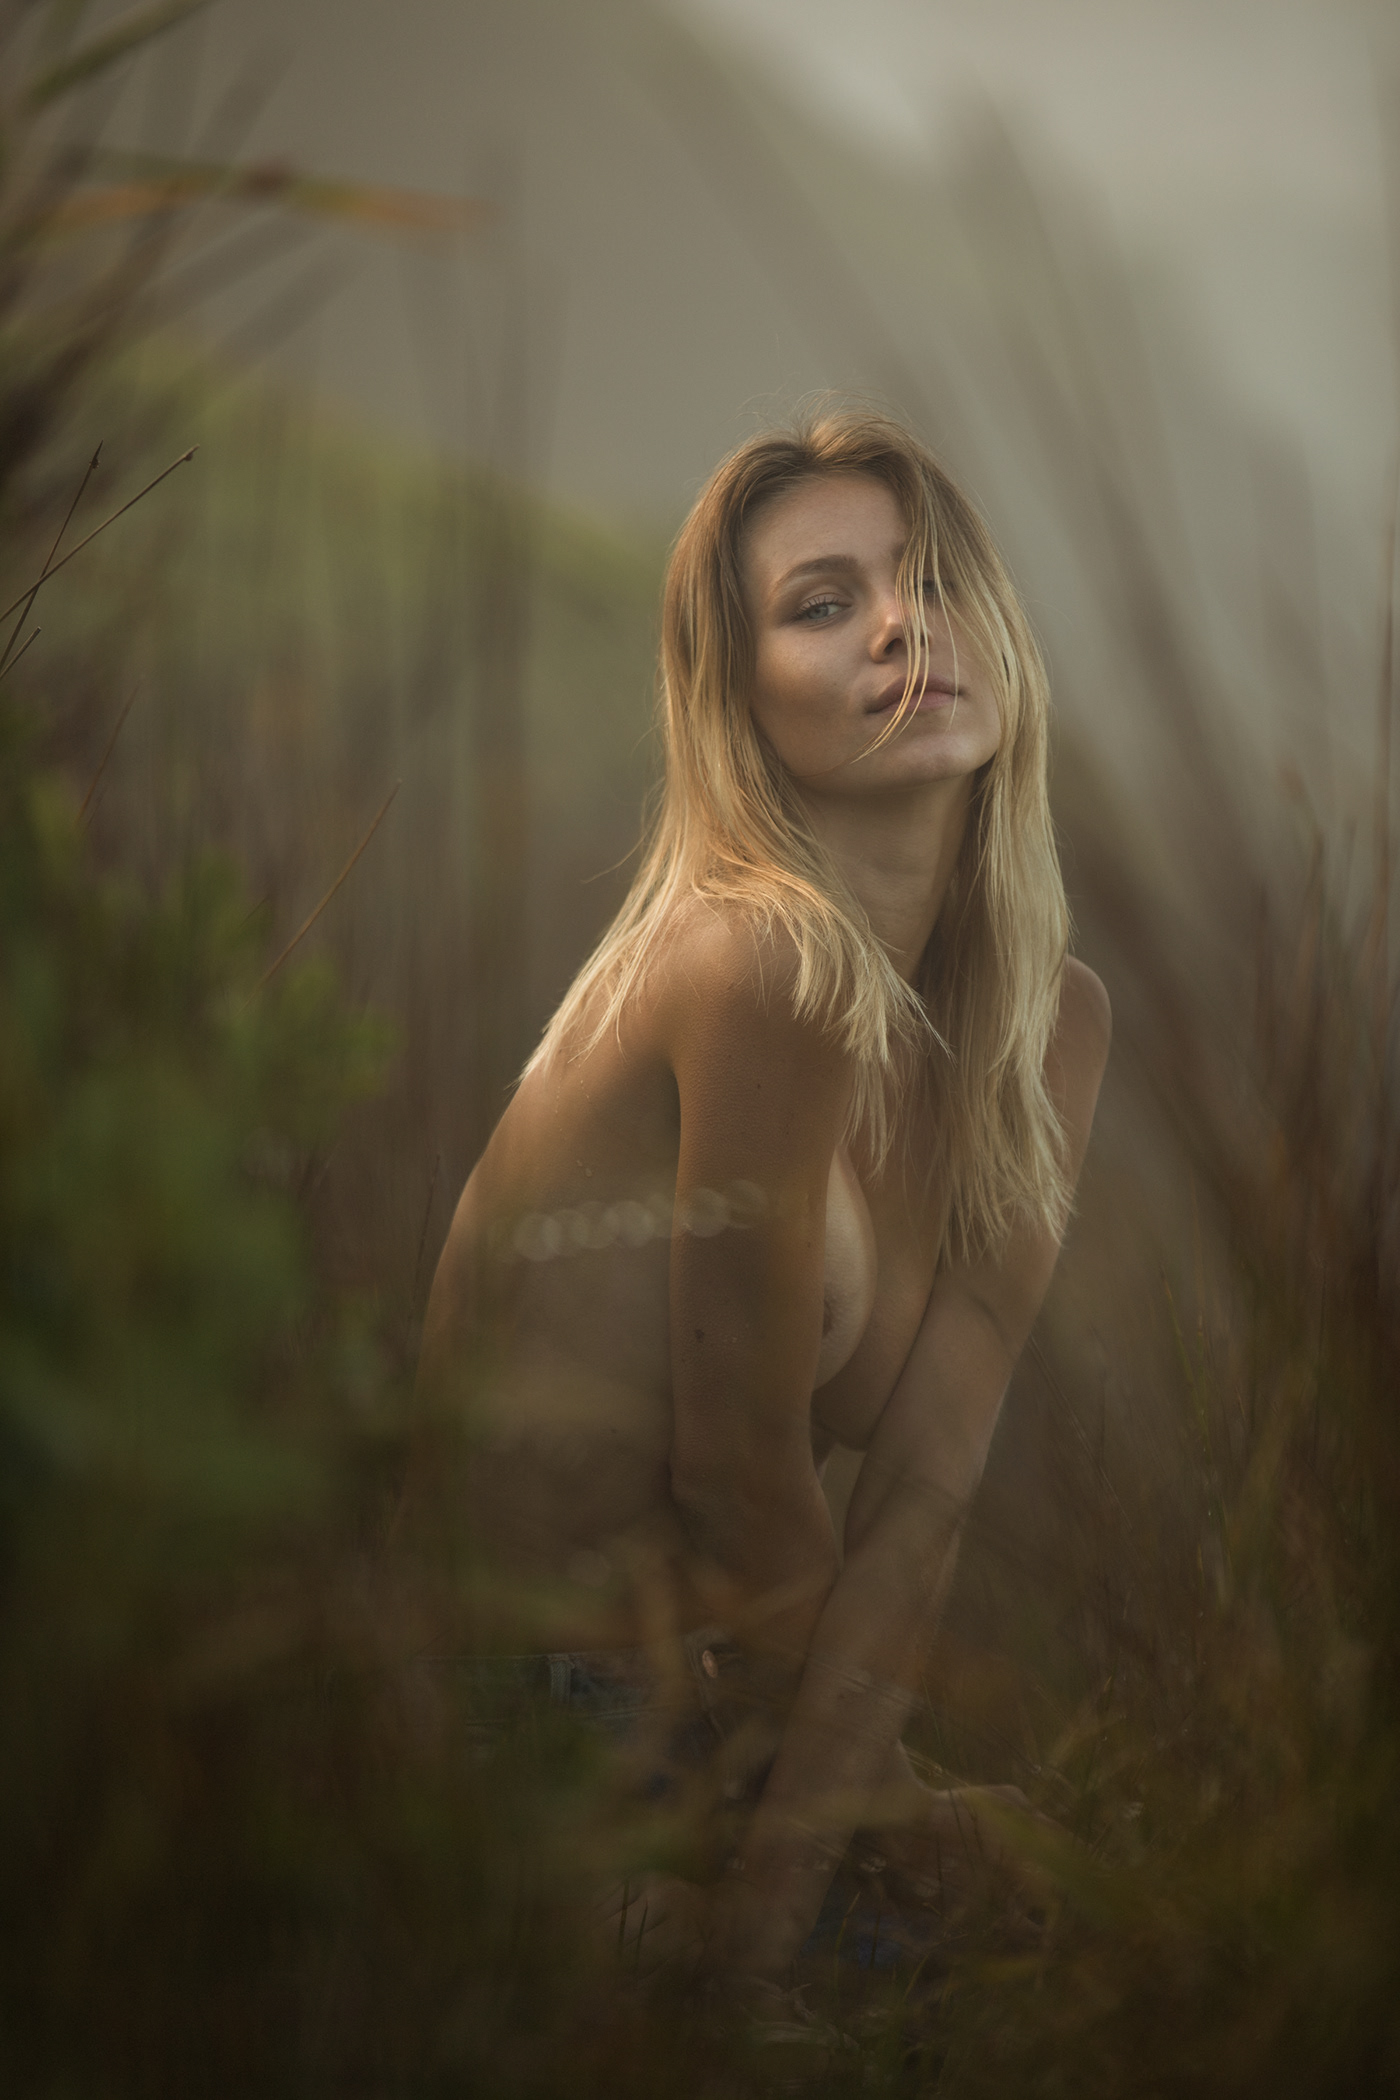 Gracie in Morning Mist shot for Rektmag / фотограф Gary Huddlestone